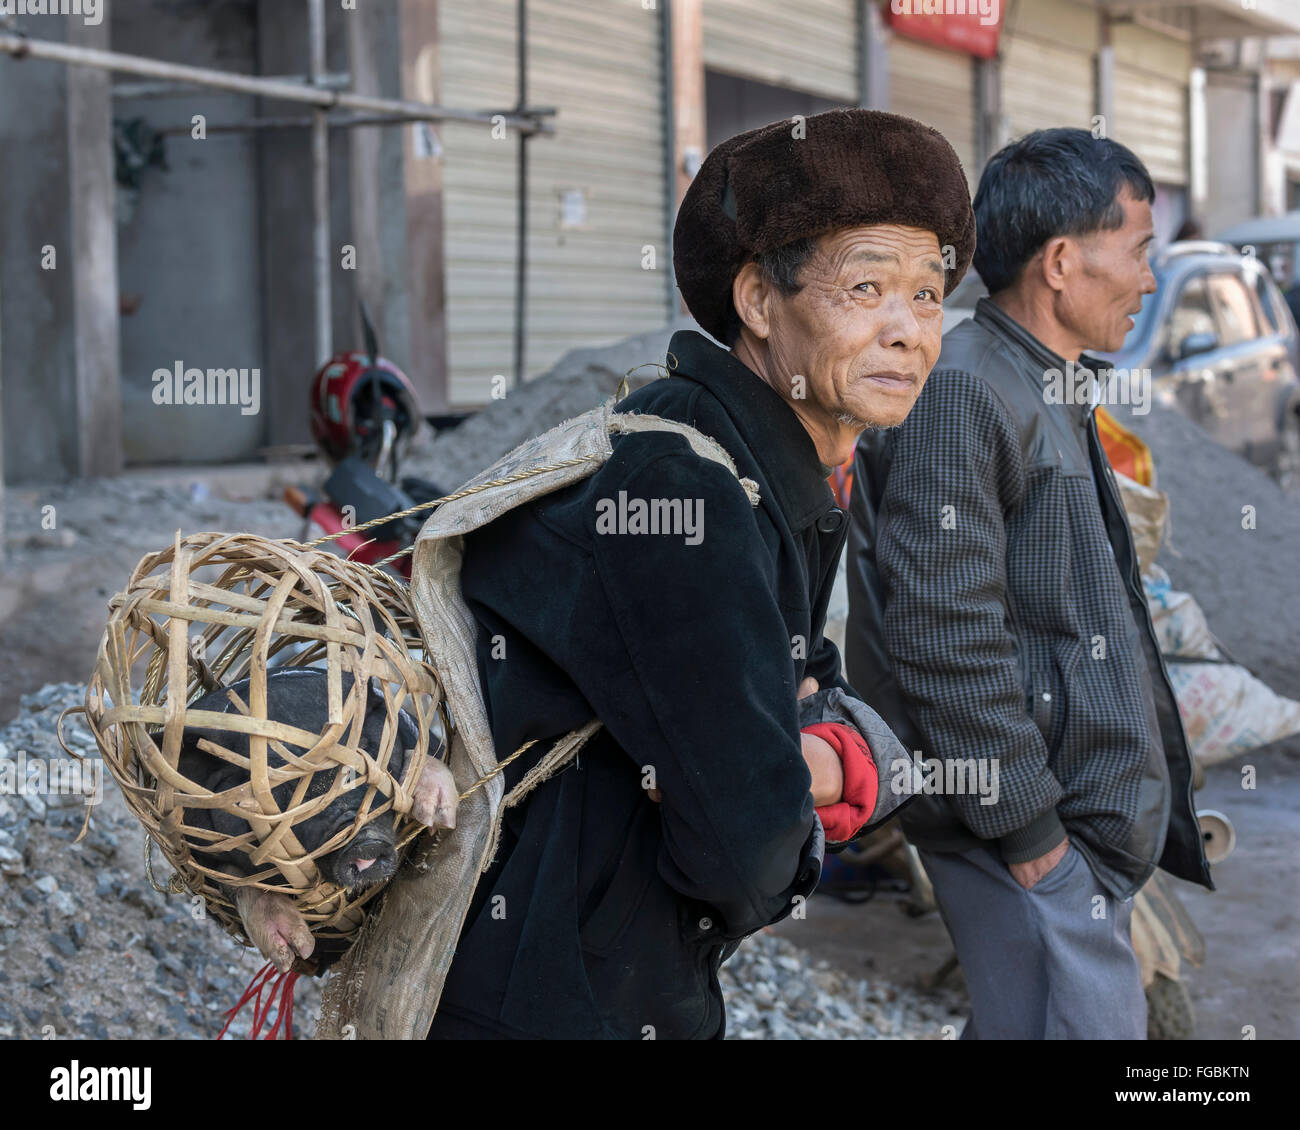 Piggy-back, man with pig in wicker basket, Niujiaozhai Market, Yunnan Province, China - Stock Image